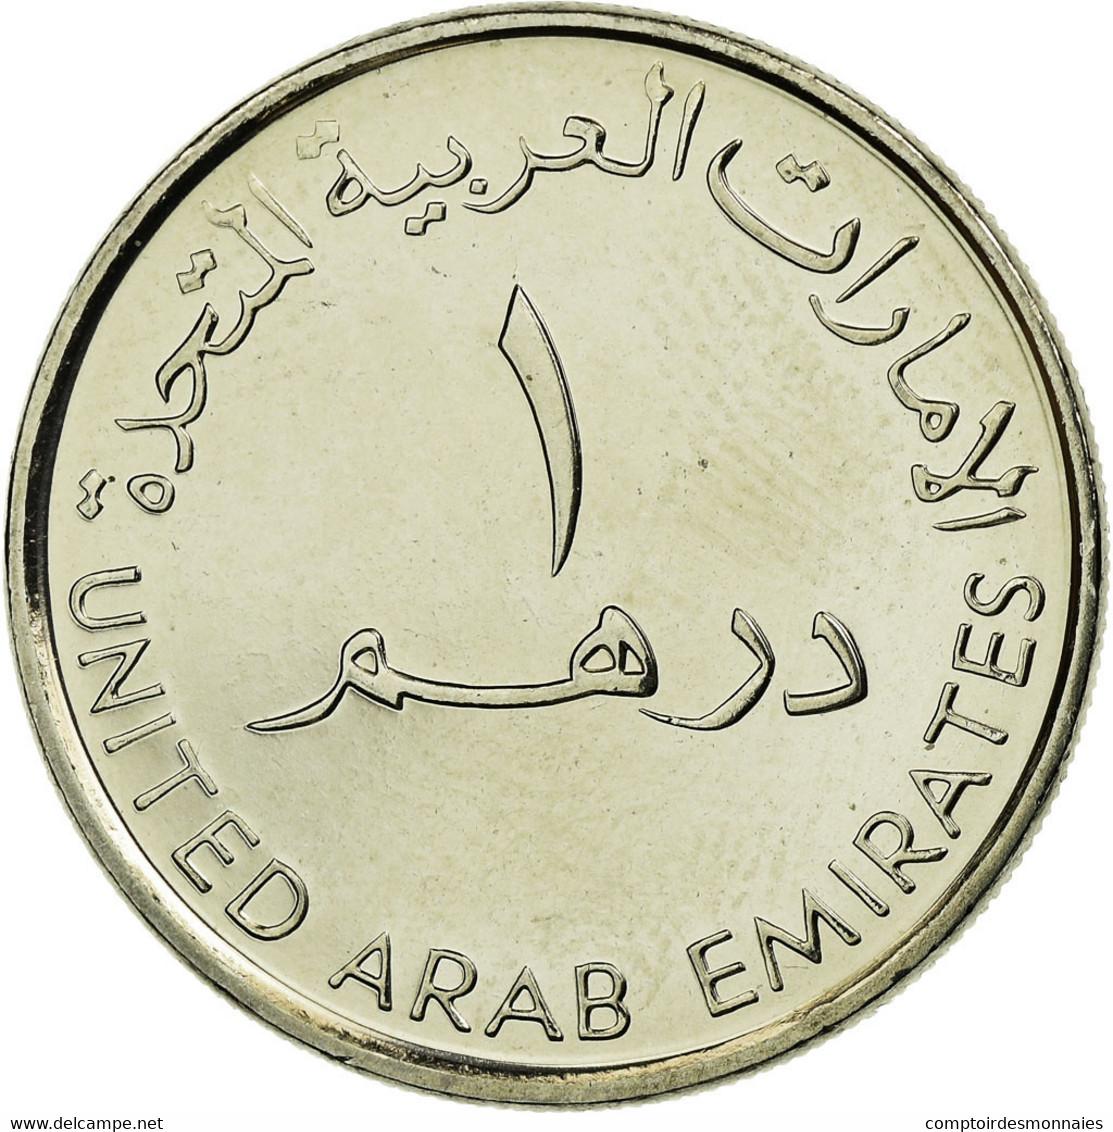 Monnaie, United Arab Emirates, Dirham, 2007/AH1428, British Royal Mint, SPL - Emirats Arabes Unis